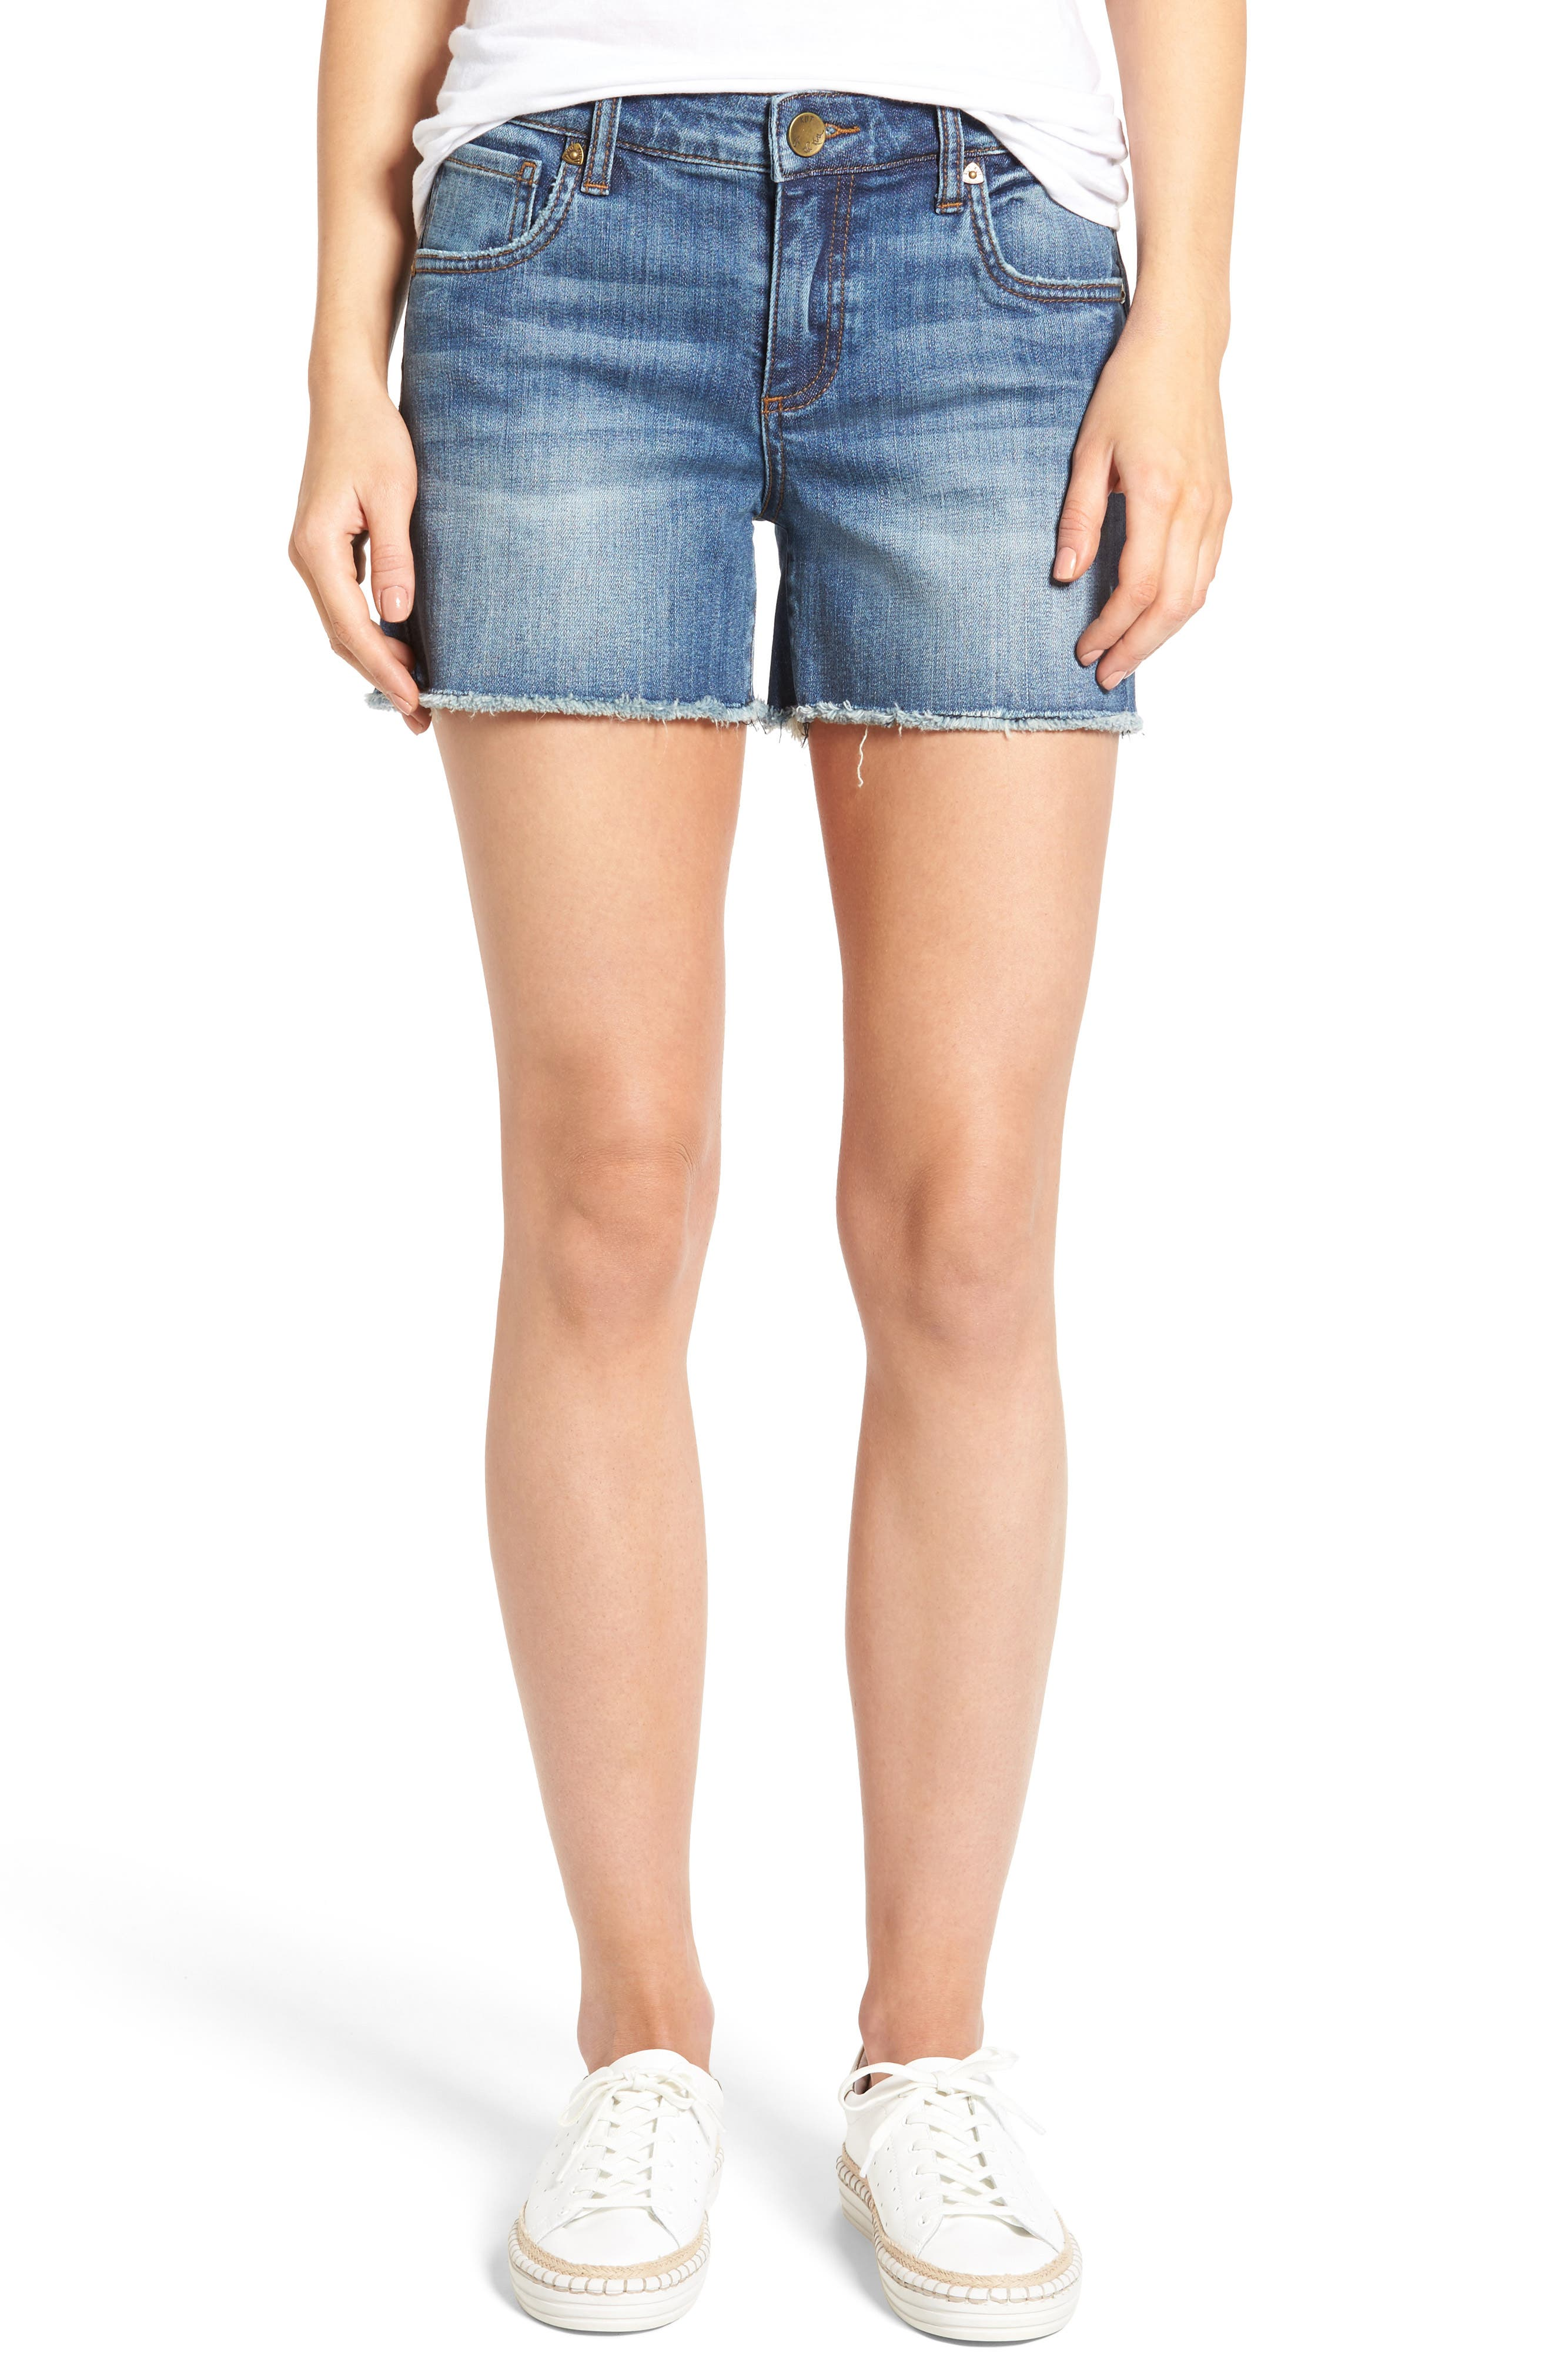 KUT from the Kloth Gidget Denim Shorts (Consolidated) (Regular & Petite)